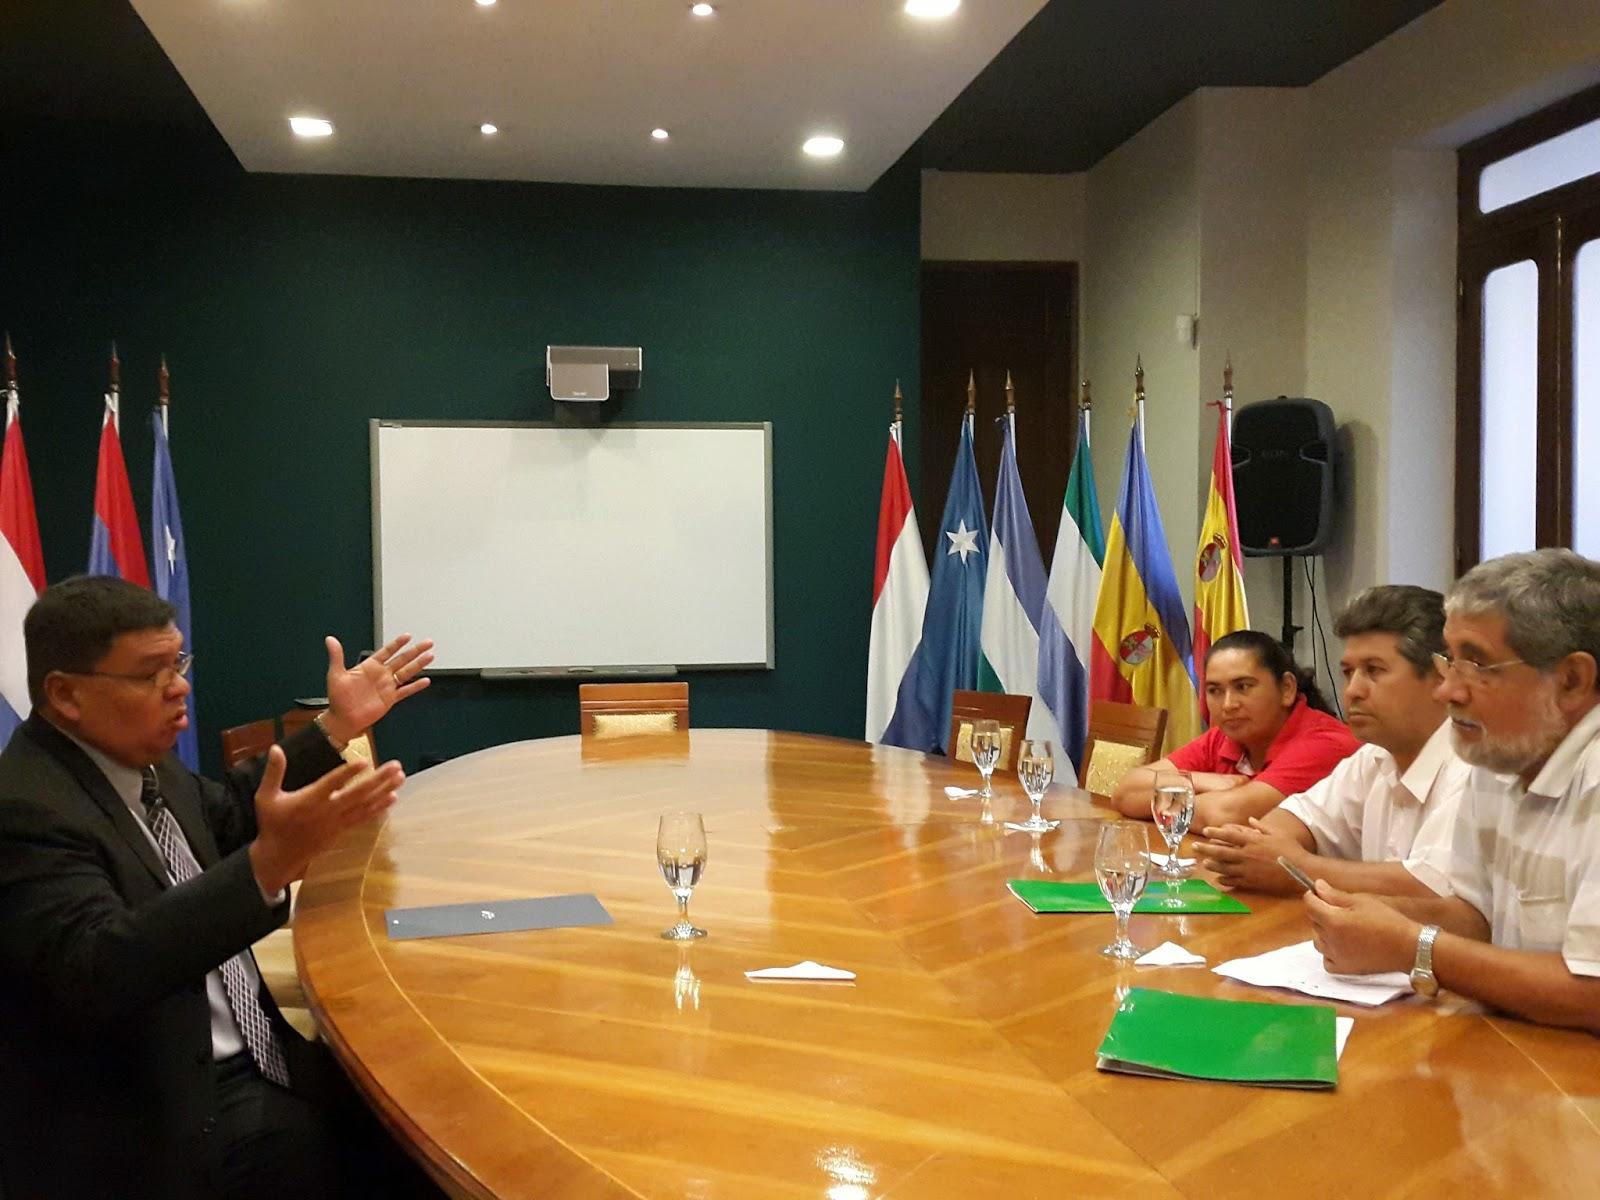 Partido paraguay pyahura entrevista de paraguay pyahura for Foto del ministro del interior